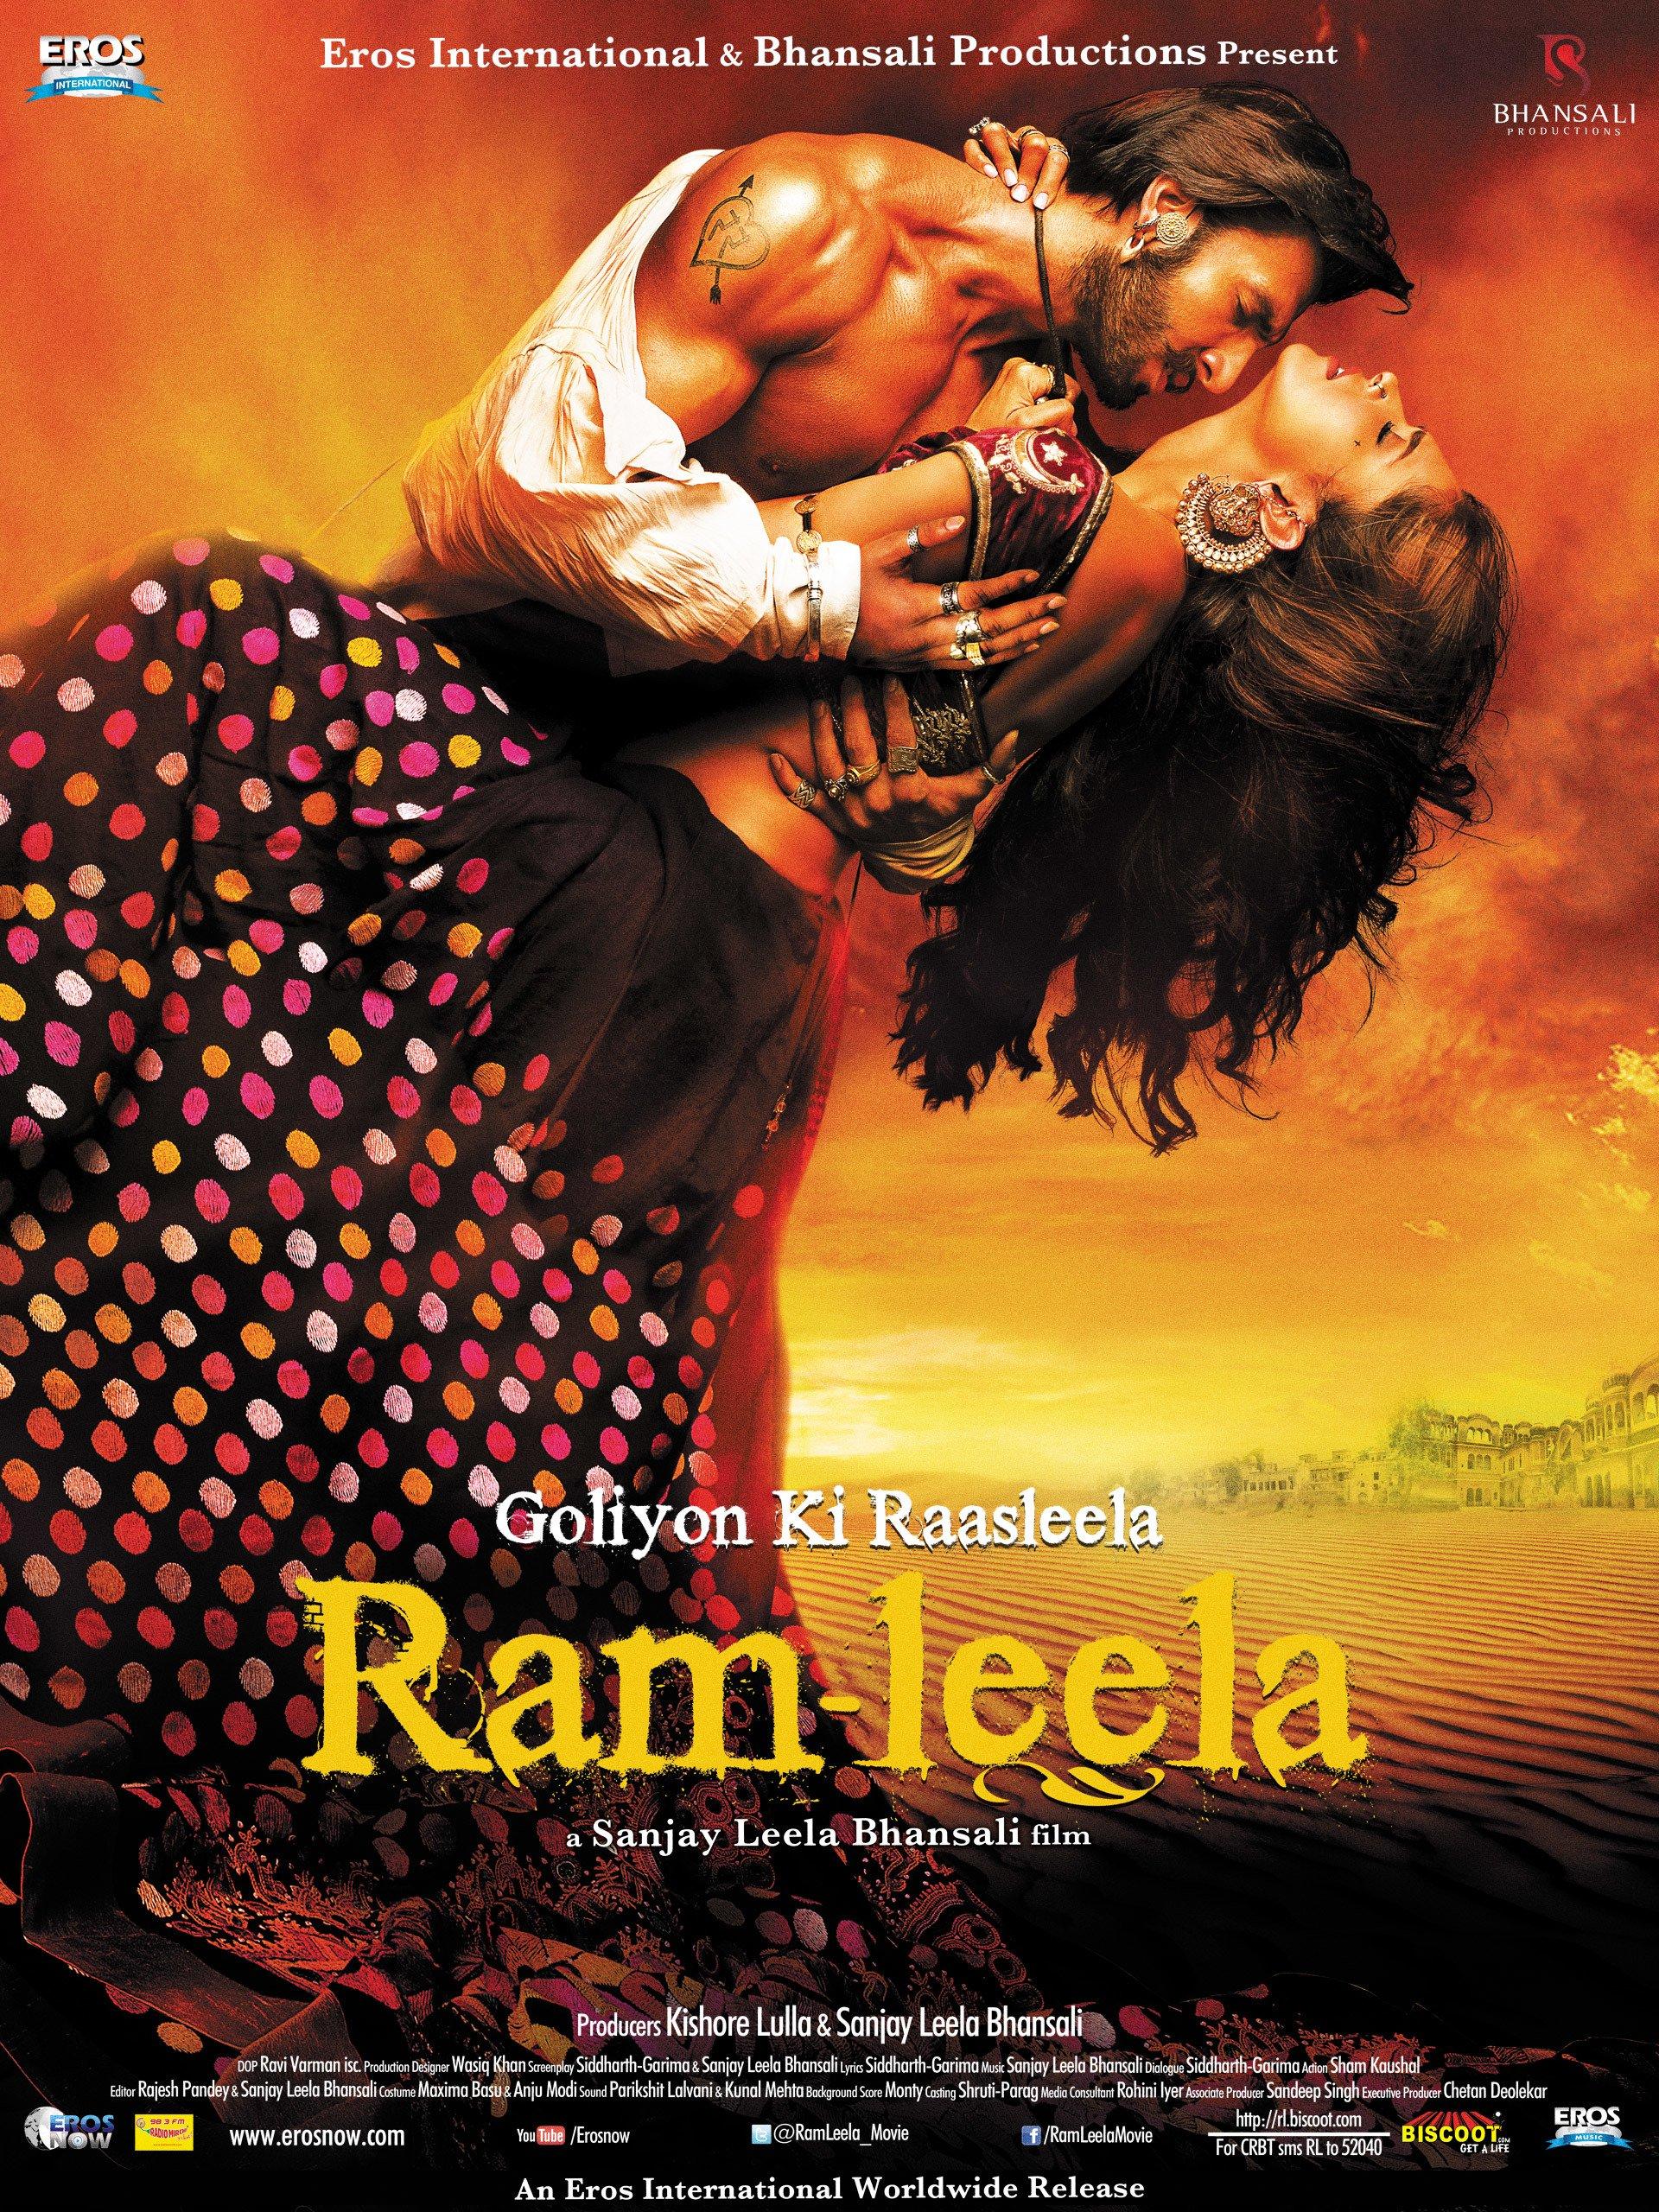 Goliyon Ki Raasleela Ram Leela Full Movie Download With